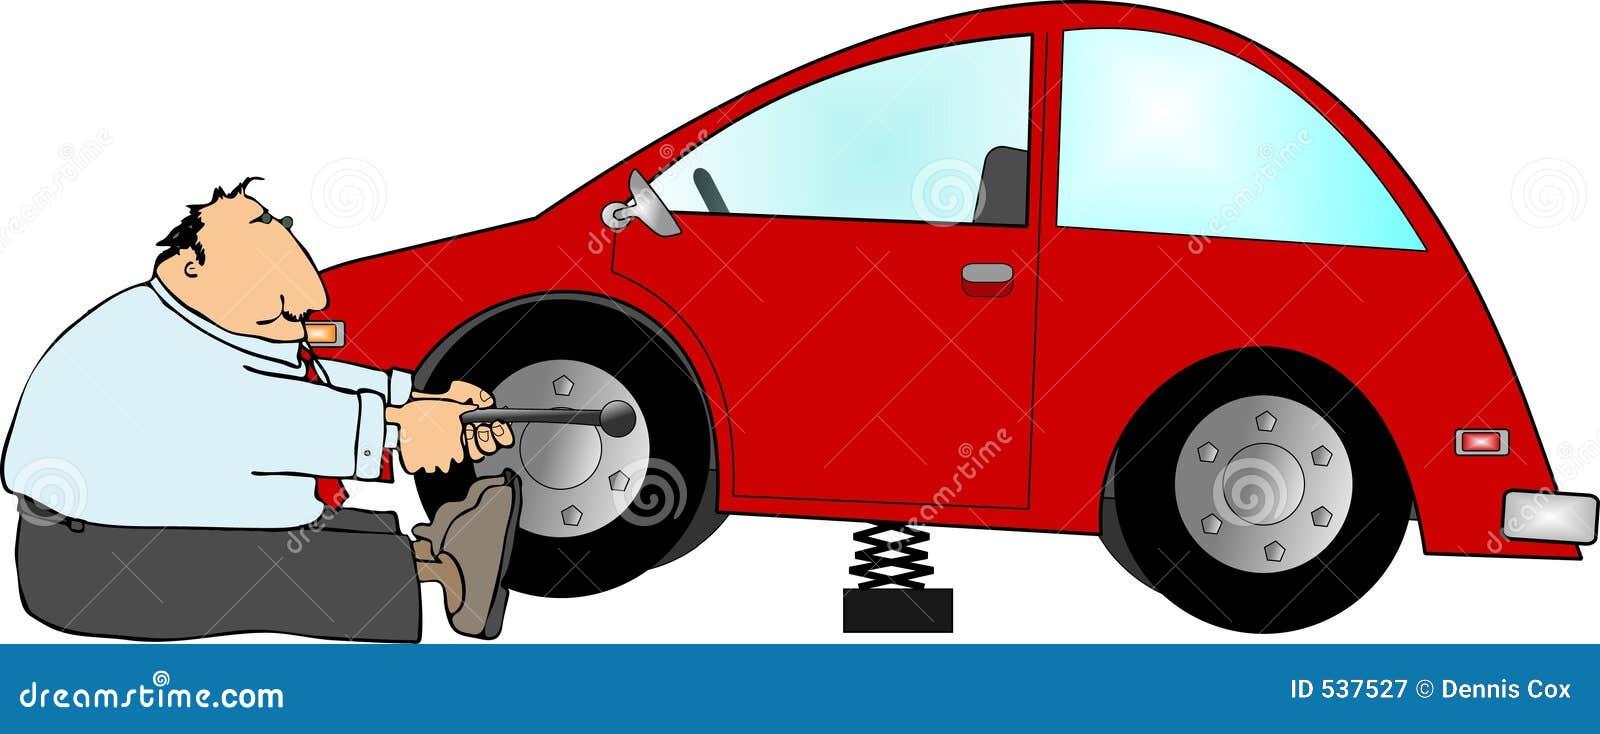 Download 泄了气的轮胎 库存例证. 插画 包括有 例证, 自动, 轮胎, automatics, 幽默, 乐趣, 把手 - 537527